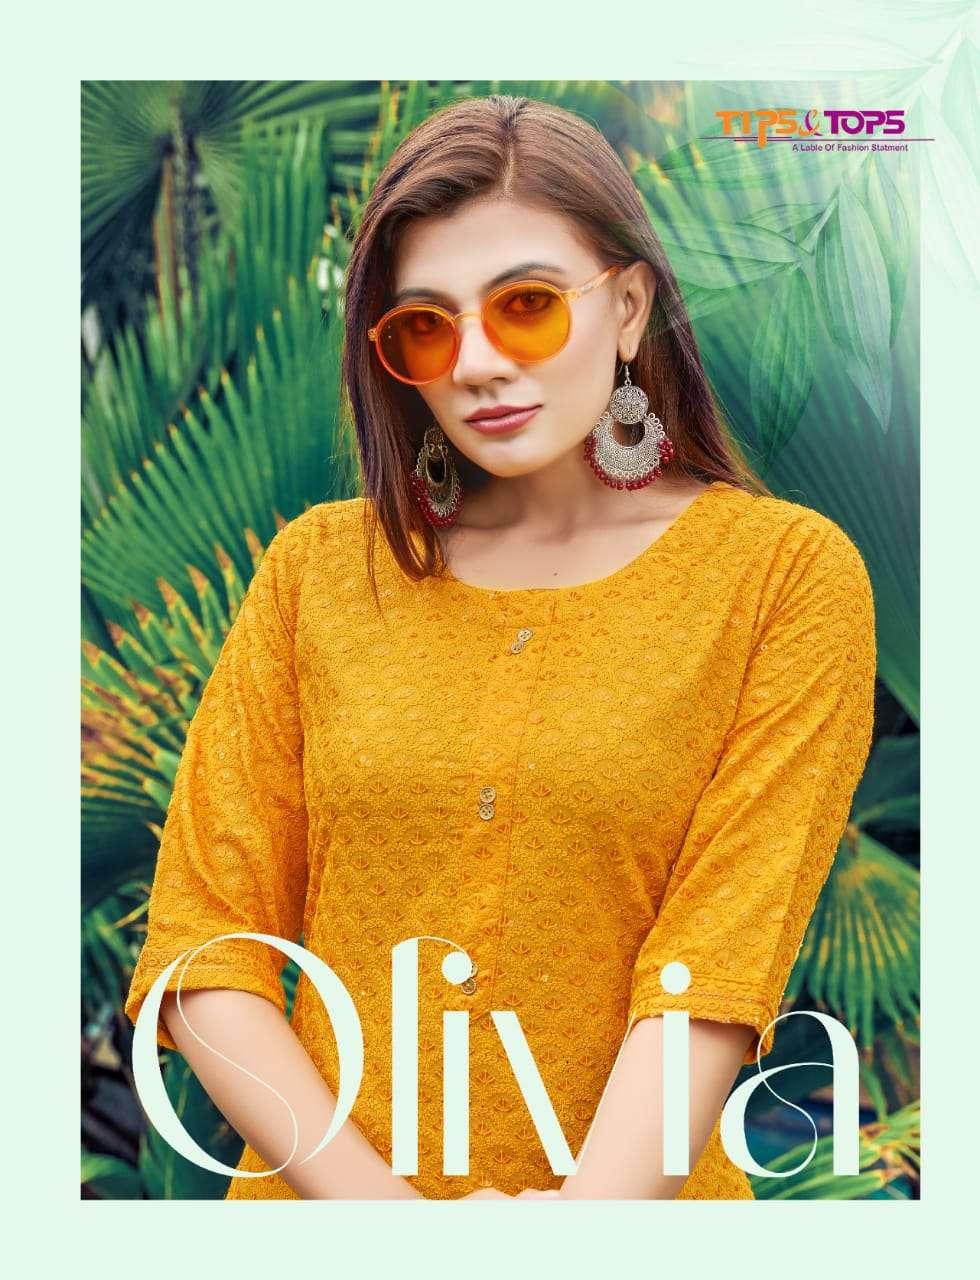 Tips and Tops Olivia Vol 2 Chikan Work Rayon Kurti New Designs